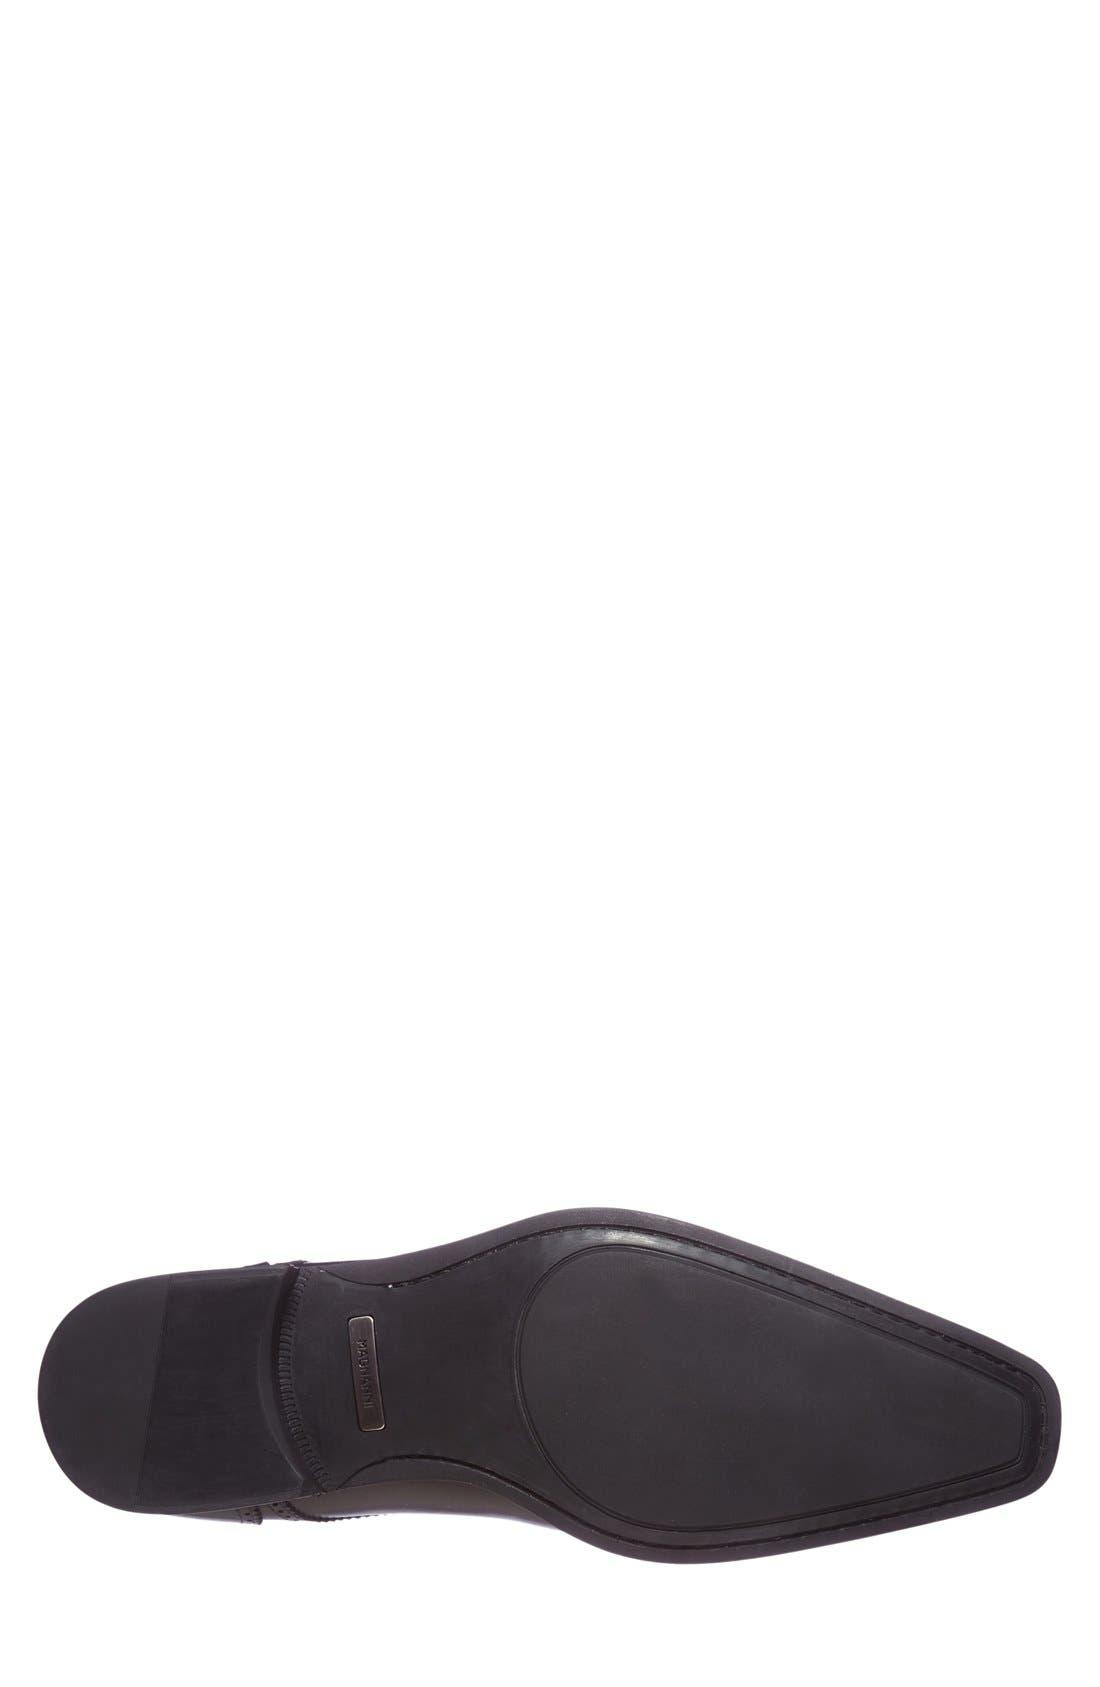 'Carlito' Cap Toe Derby,                             Alternate thumbnail 4, color,                             Black